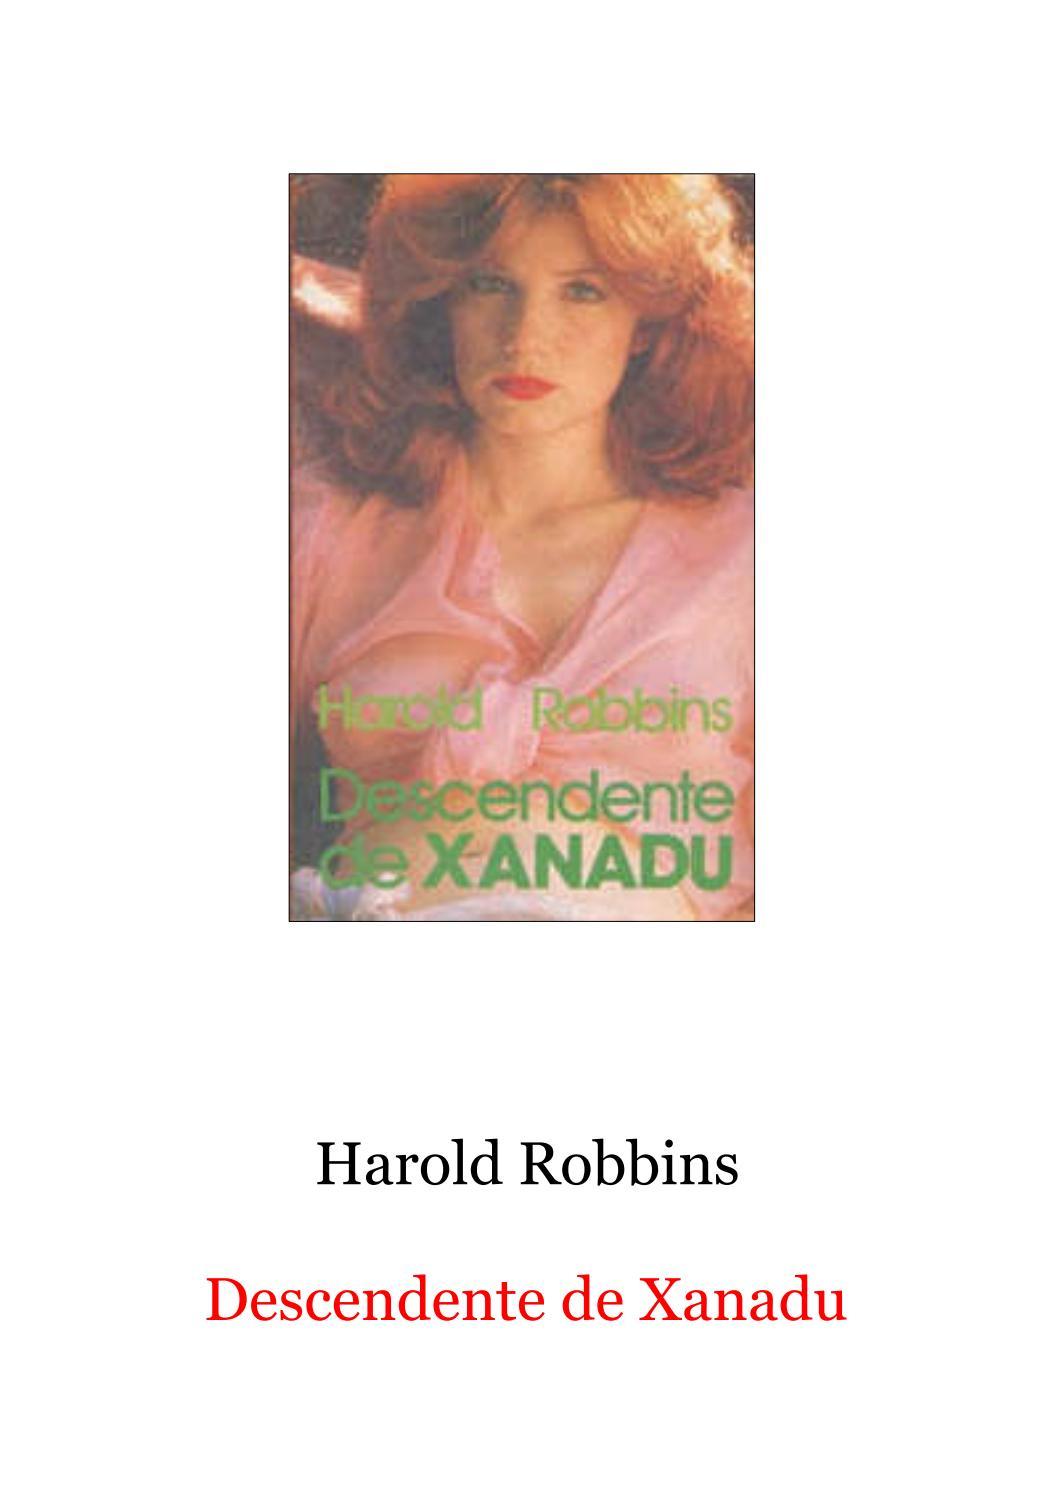 eee302e3b Harold robbins os pervertidos by Elizabeth Happy Harvest Wovili - issuu